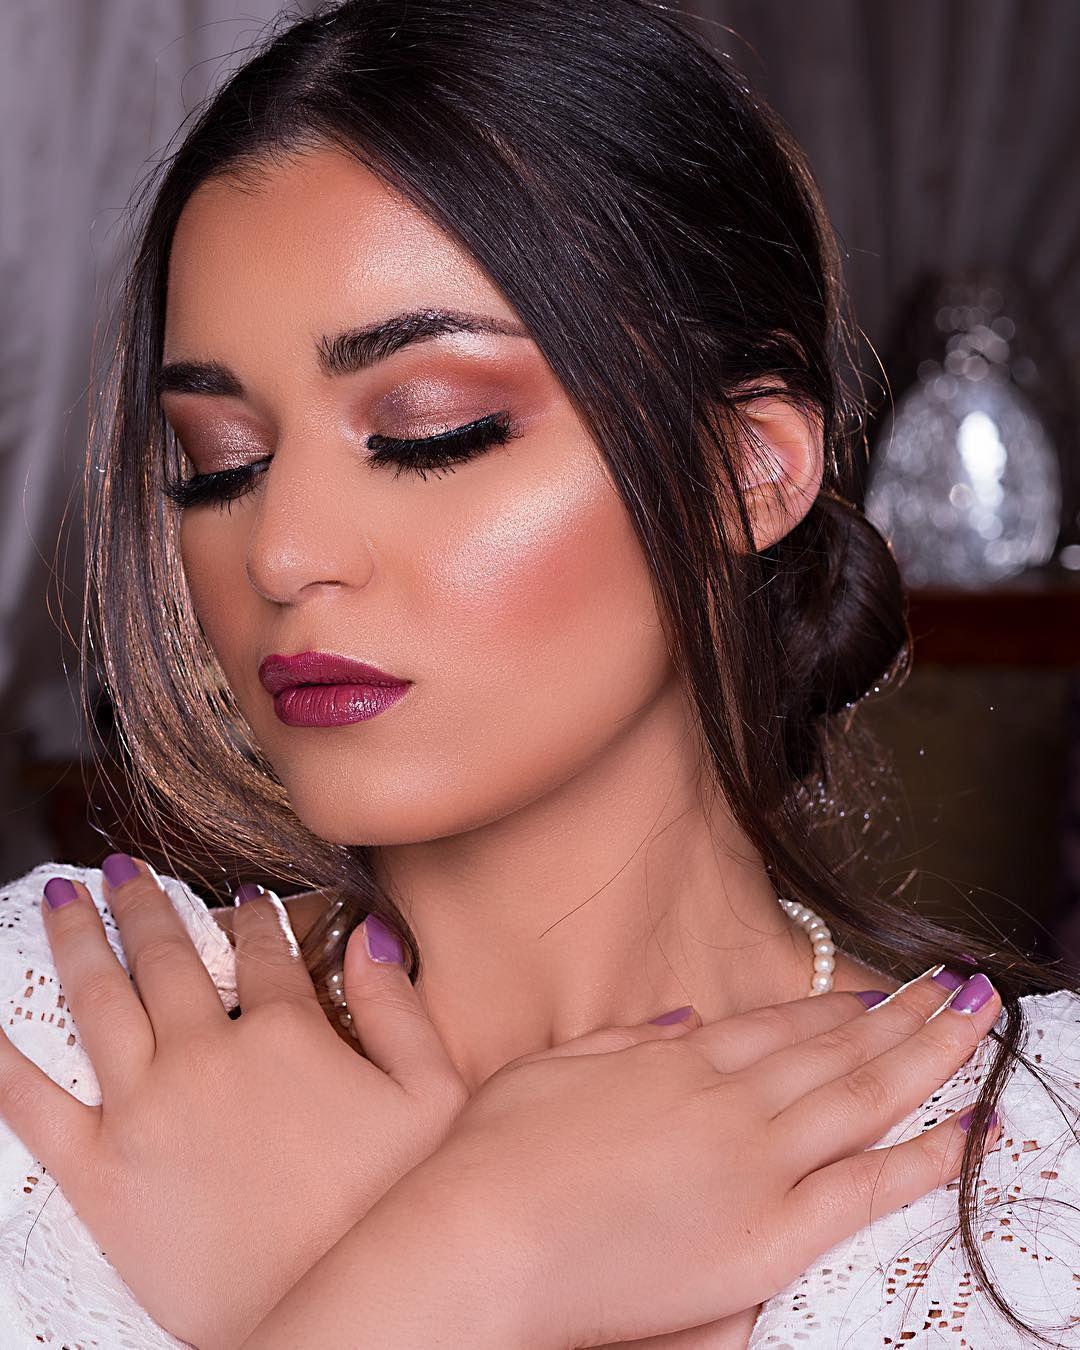 Makeup artist Meaad Country Saudi Arabia https